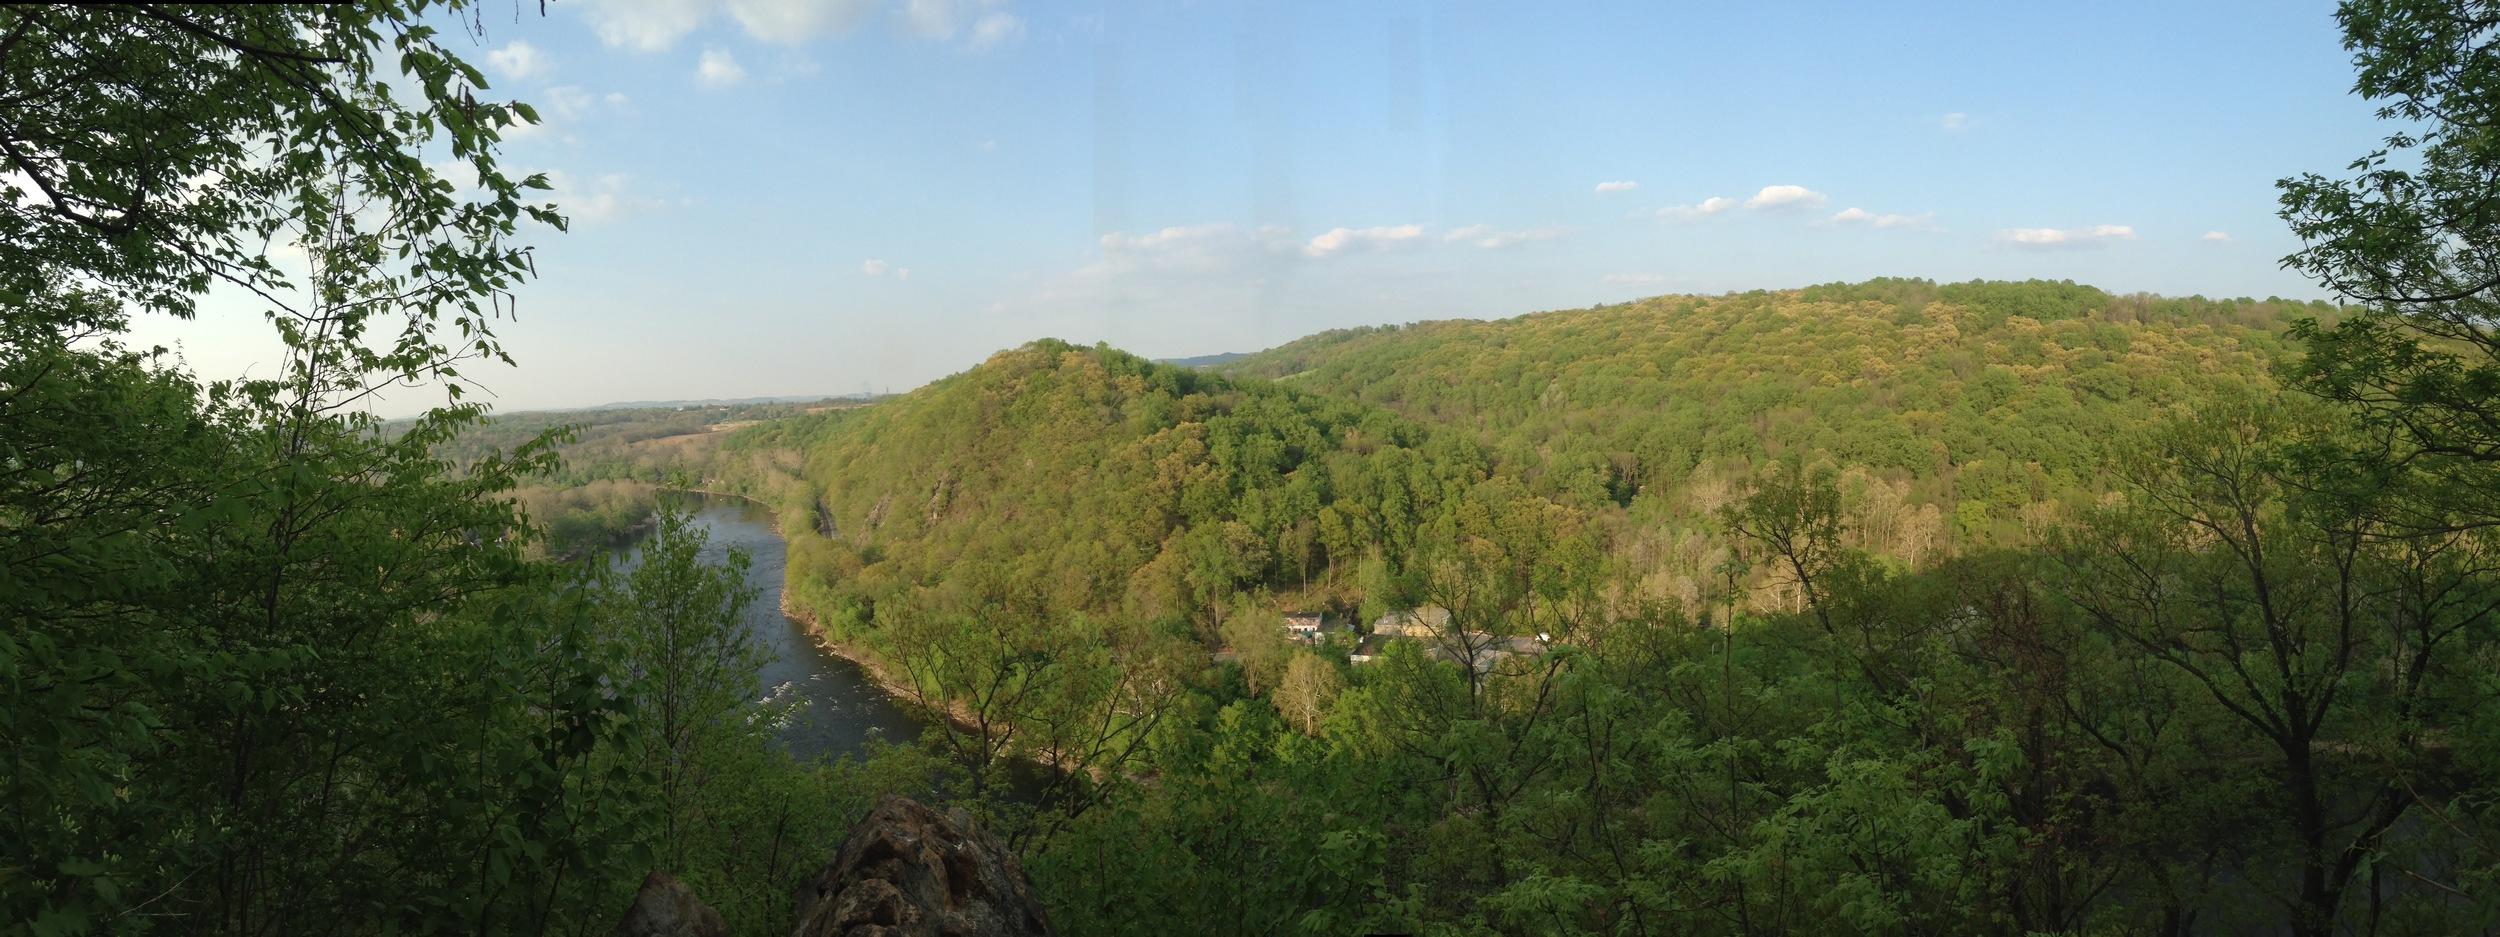 gollub-park-overlook-panorama